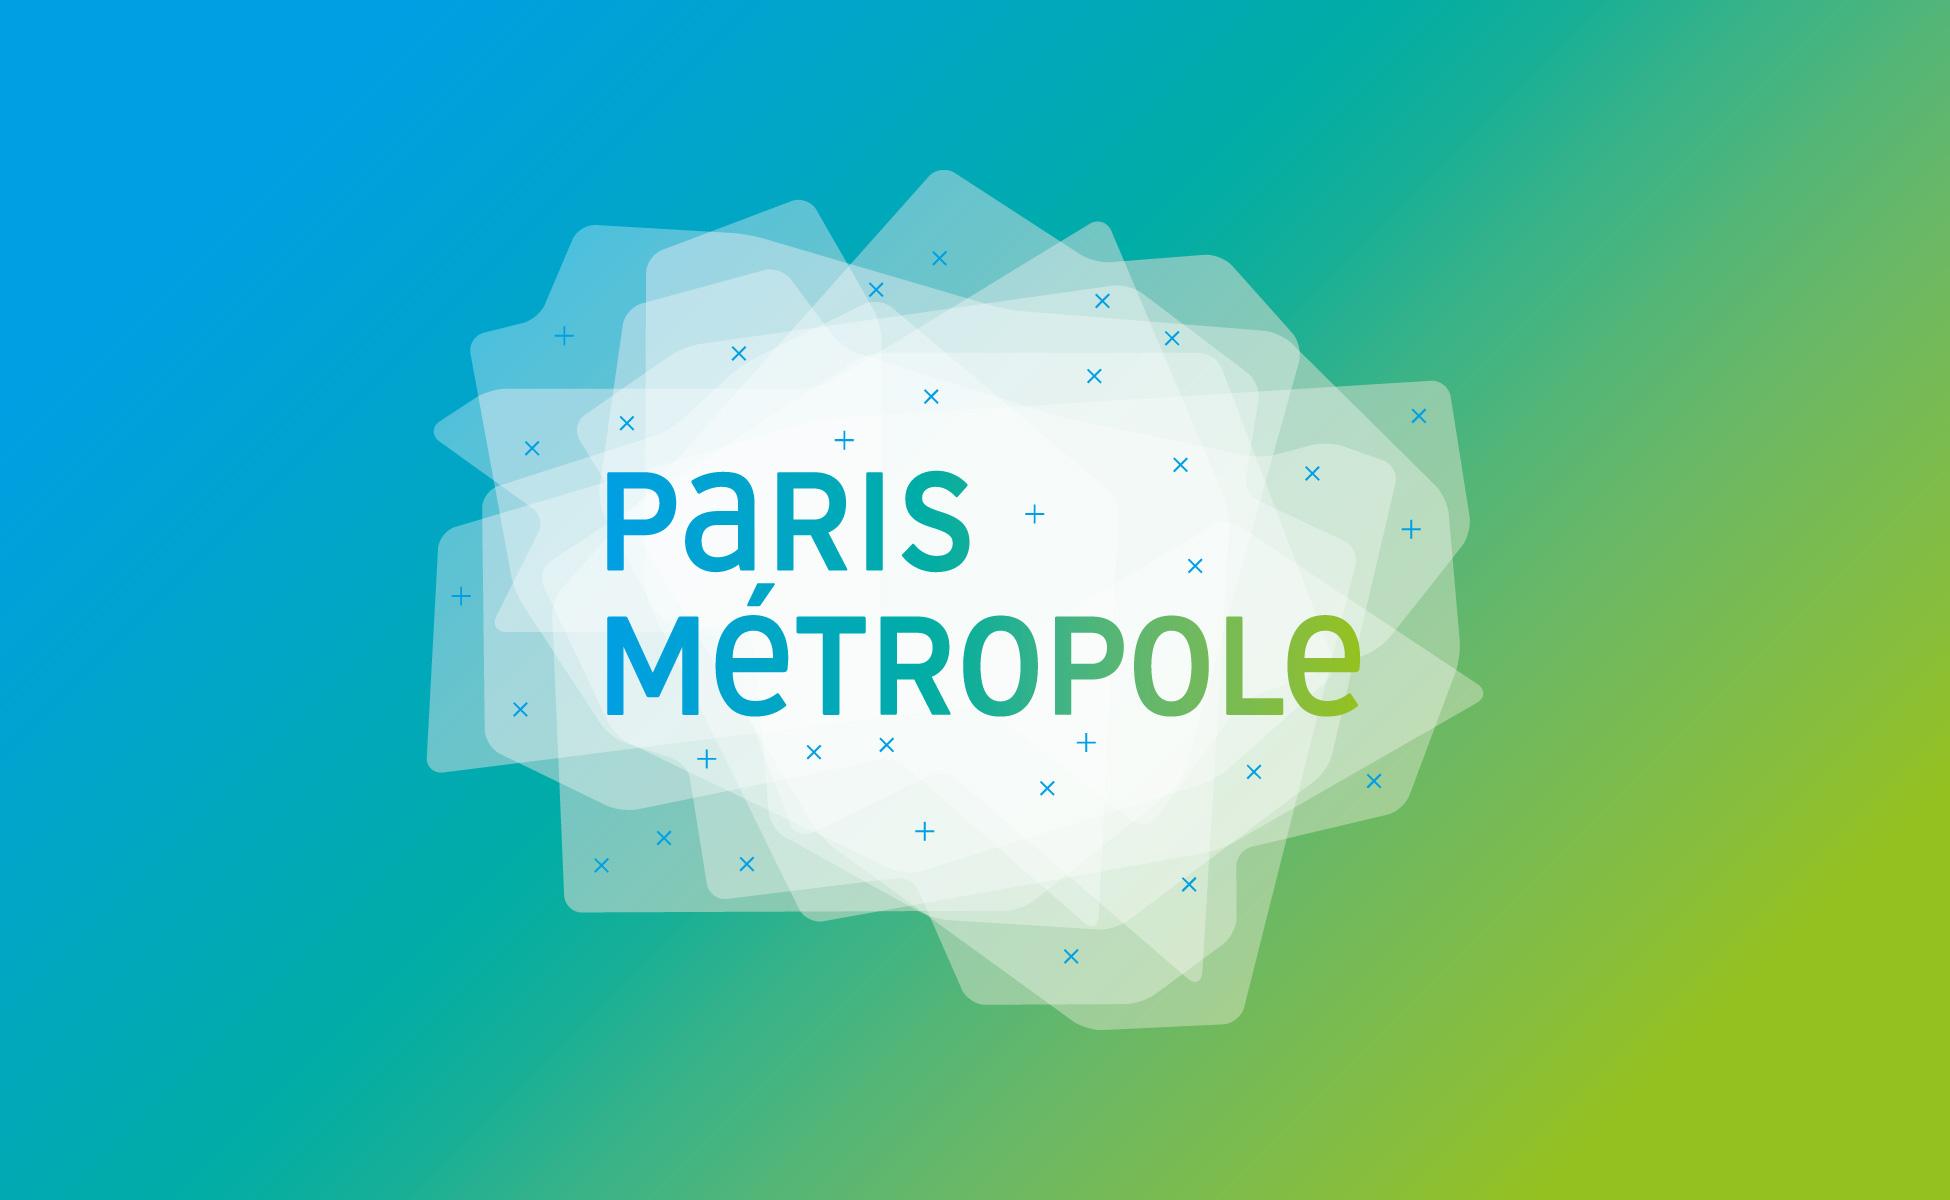 logo-design-paris-metropole-gradient-blue-green